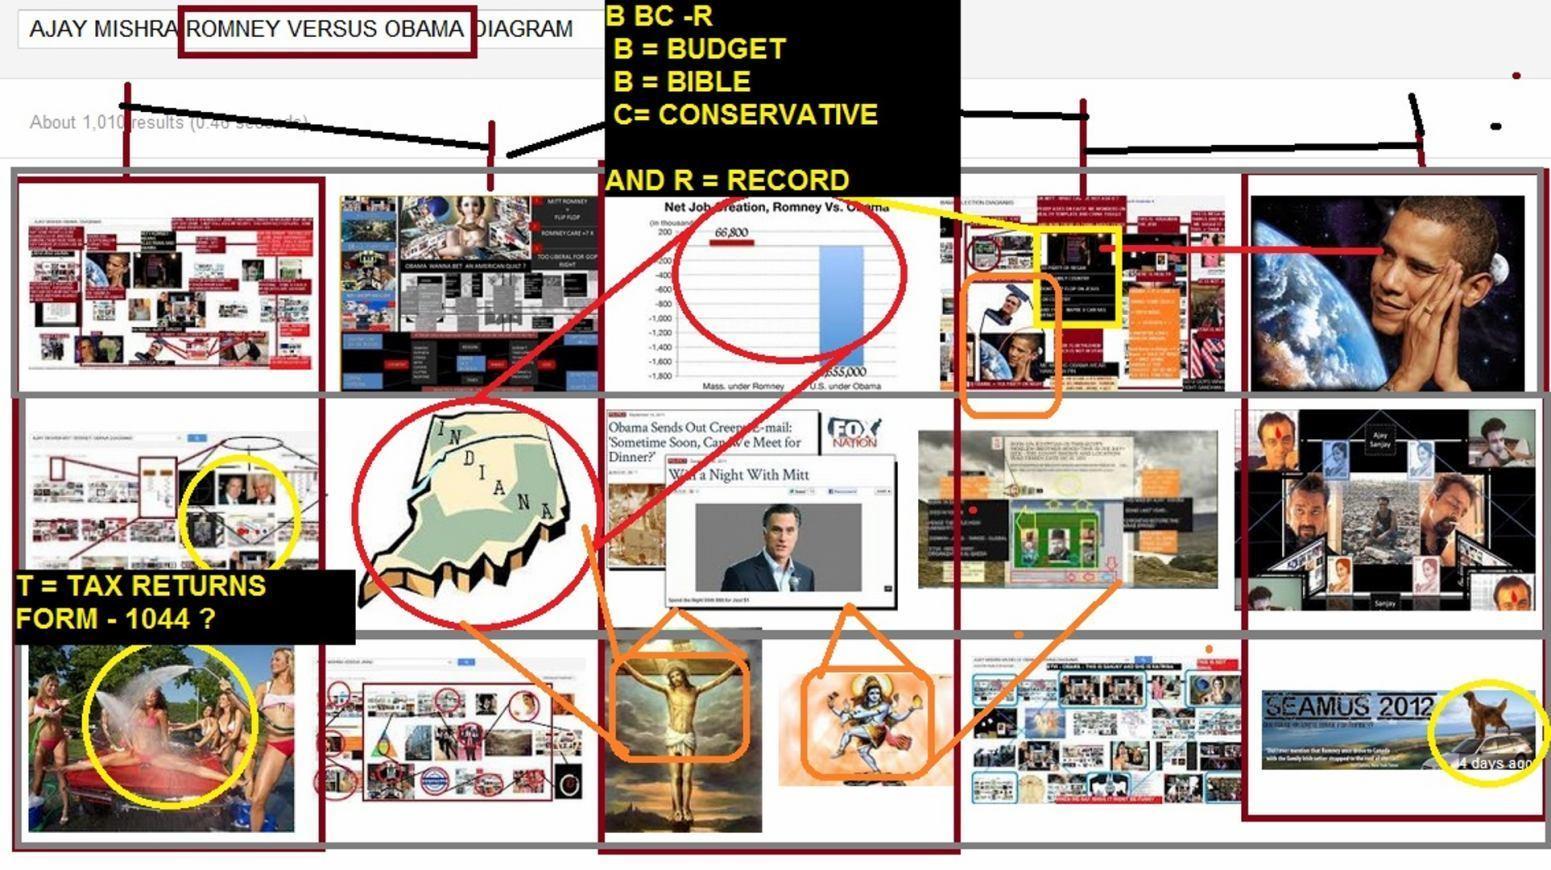 5d435-ajay_mishra_romney_versus_obama-diagram2bsomehow2bthis2b253d2bhas2bindiana2b-btw252c2bted2bcruz2bquit2b-2bu2bknow2bsomeone2bin2but2busa